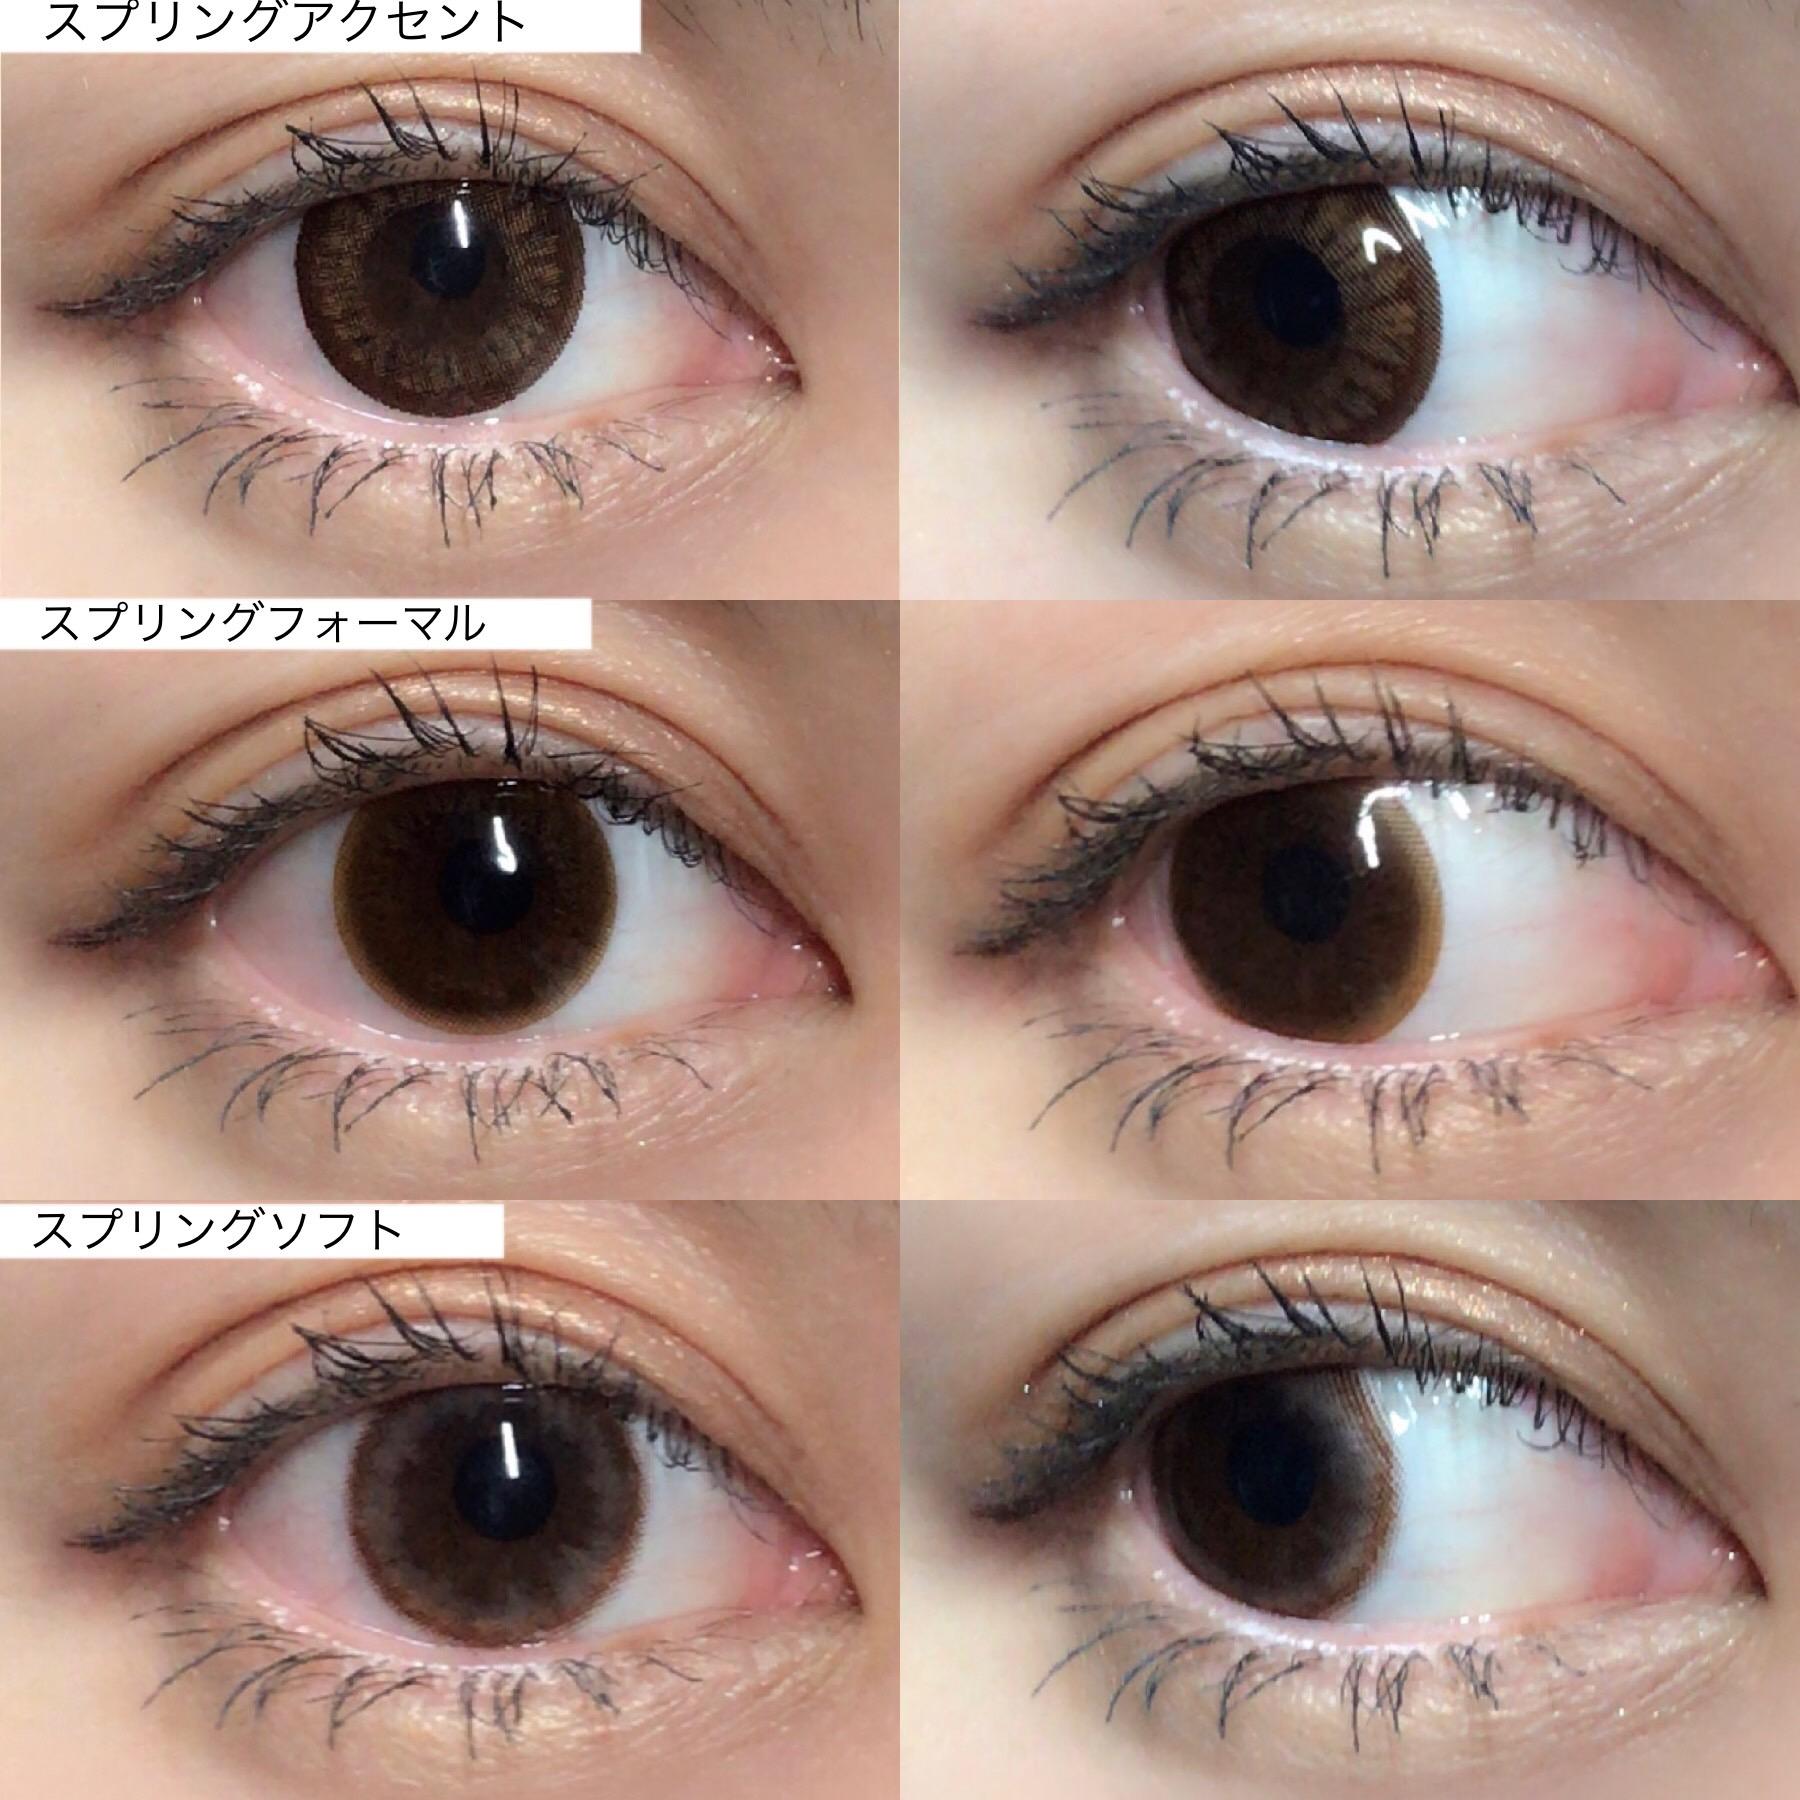 PERSONAL by Venus Eyes(パーソナル by ヴィーナスアイズ)スプリング全色を着用して比較した画像